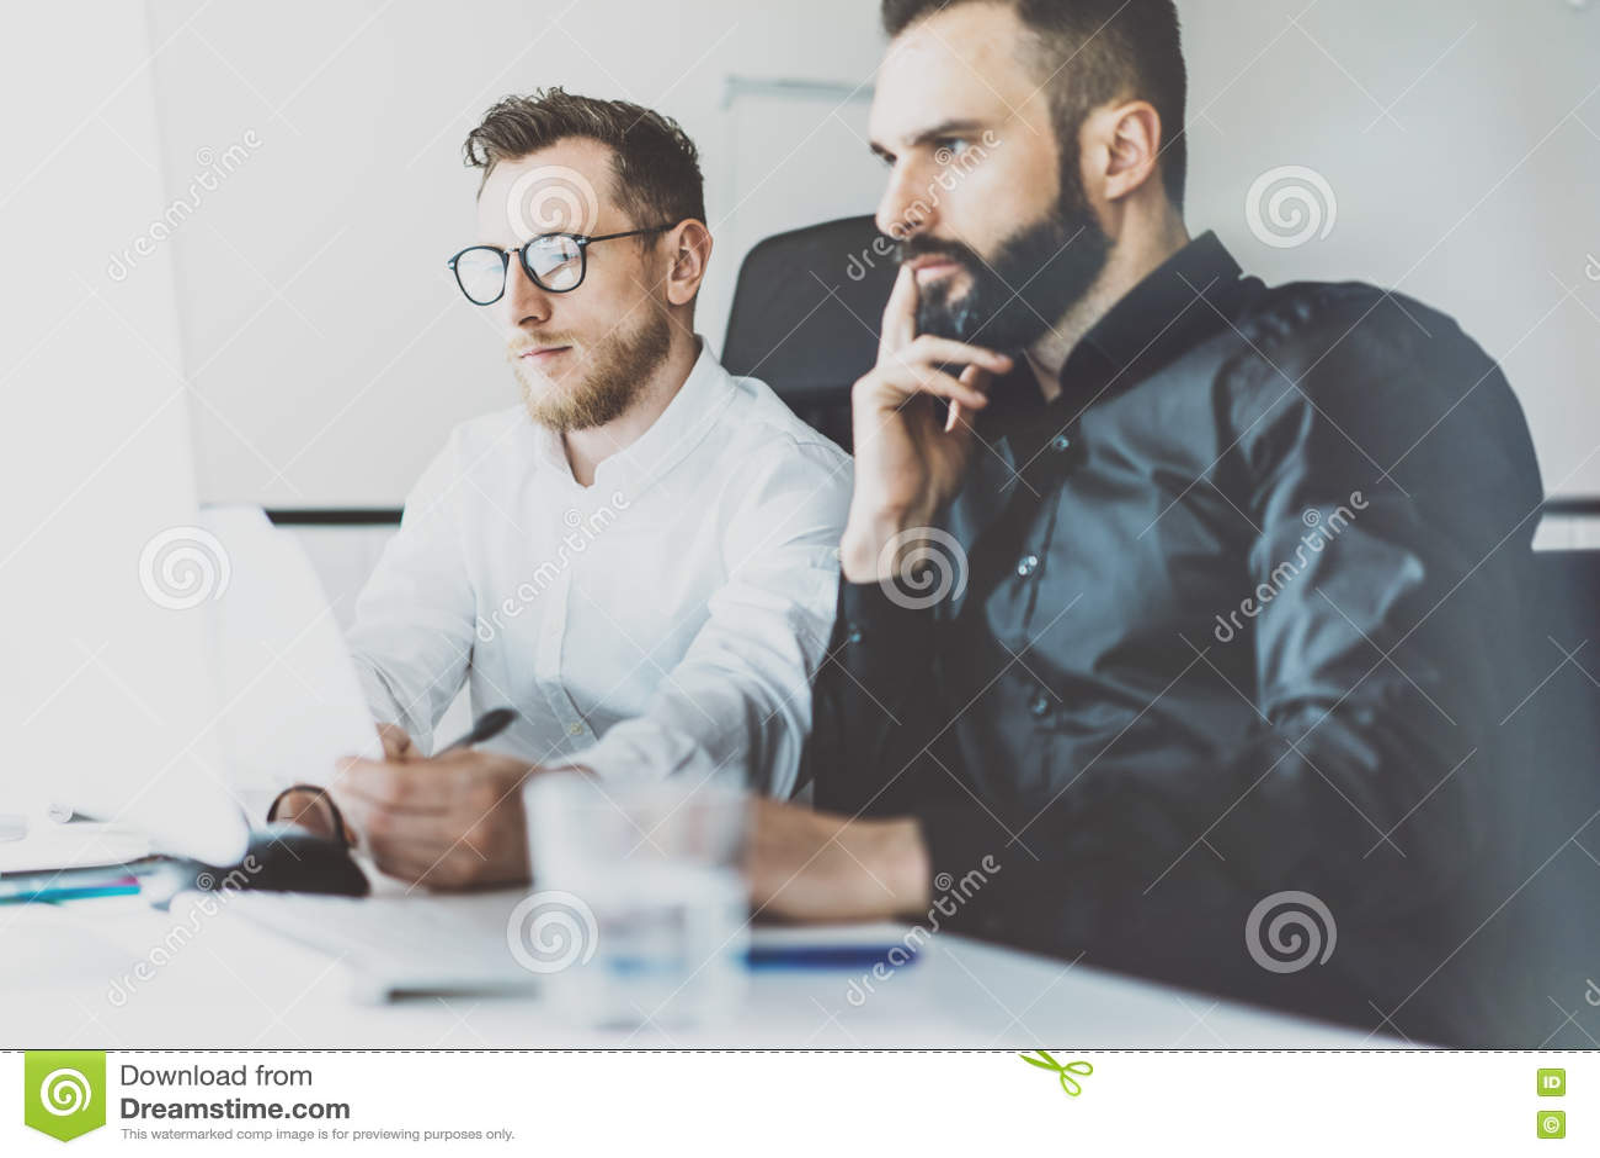 Coworking过程照片 财务经理队工作新的想法 年轻企业乘员组与起始的现代办公室一起使用